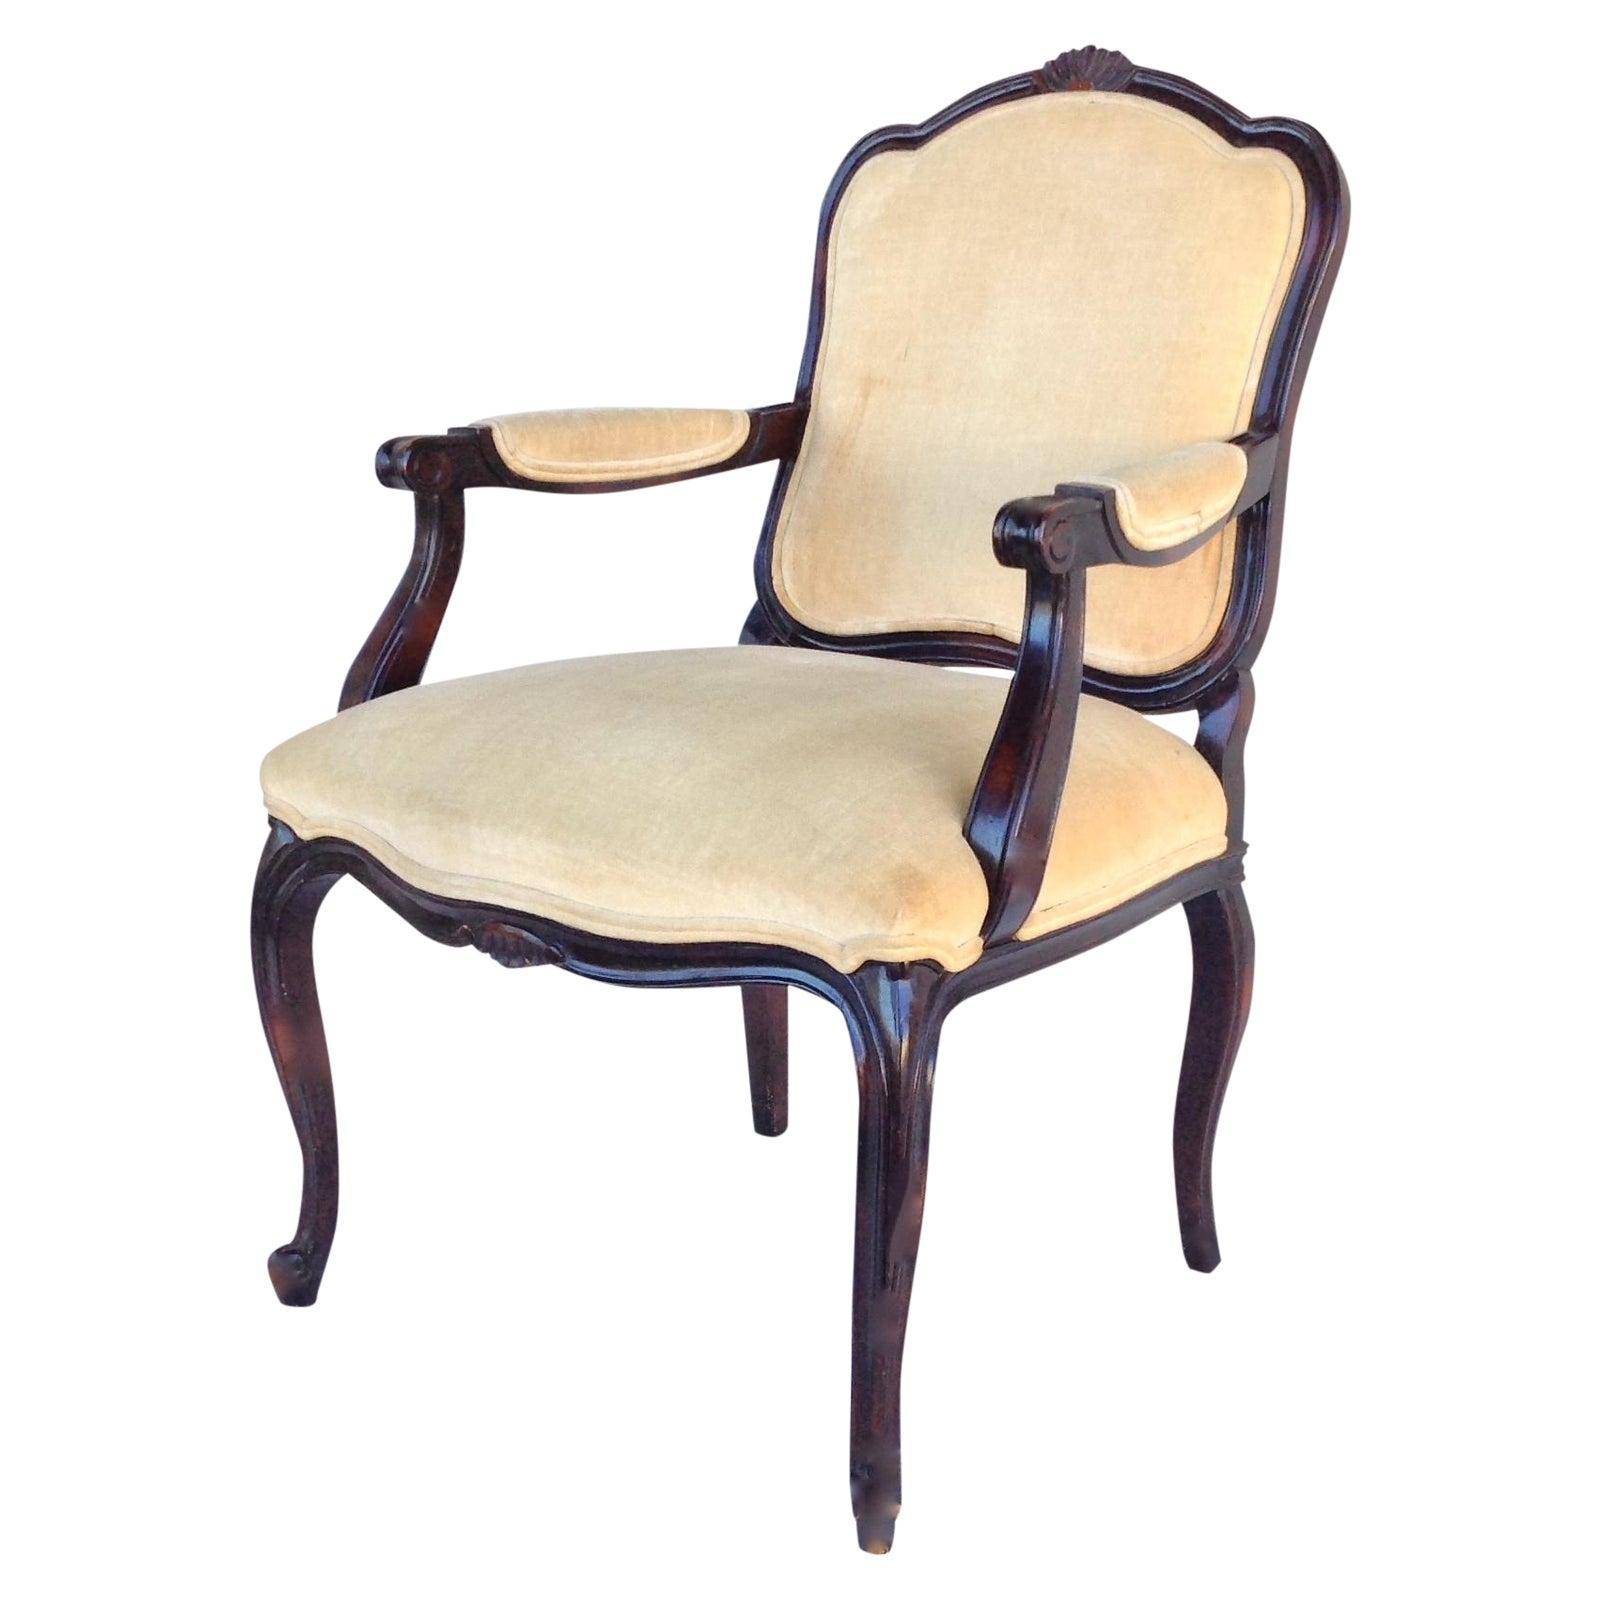 century furniture louis xv fauteuil arm chair chairish